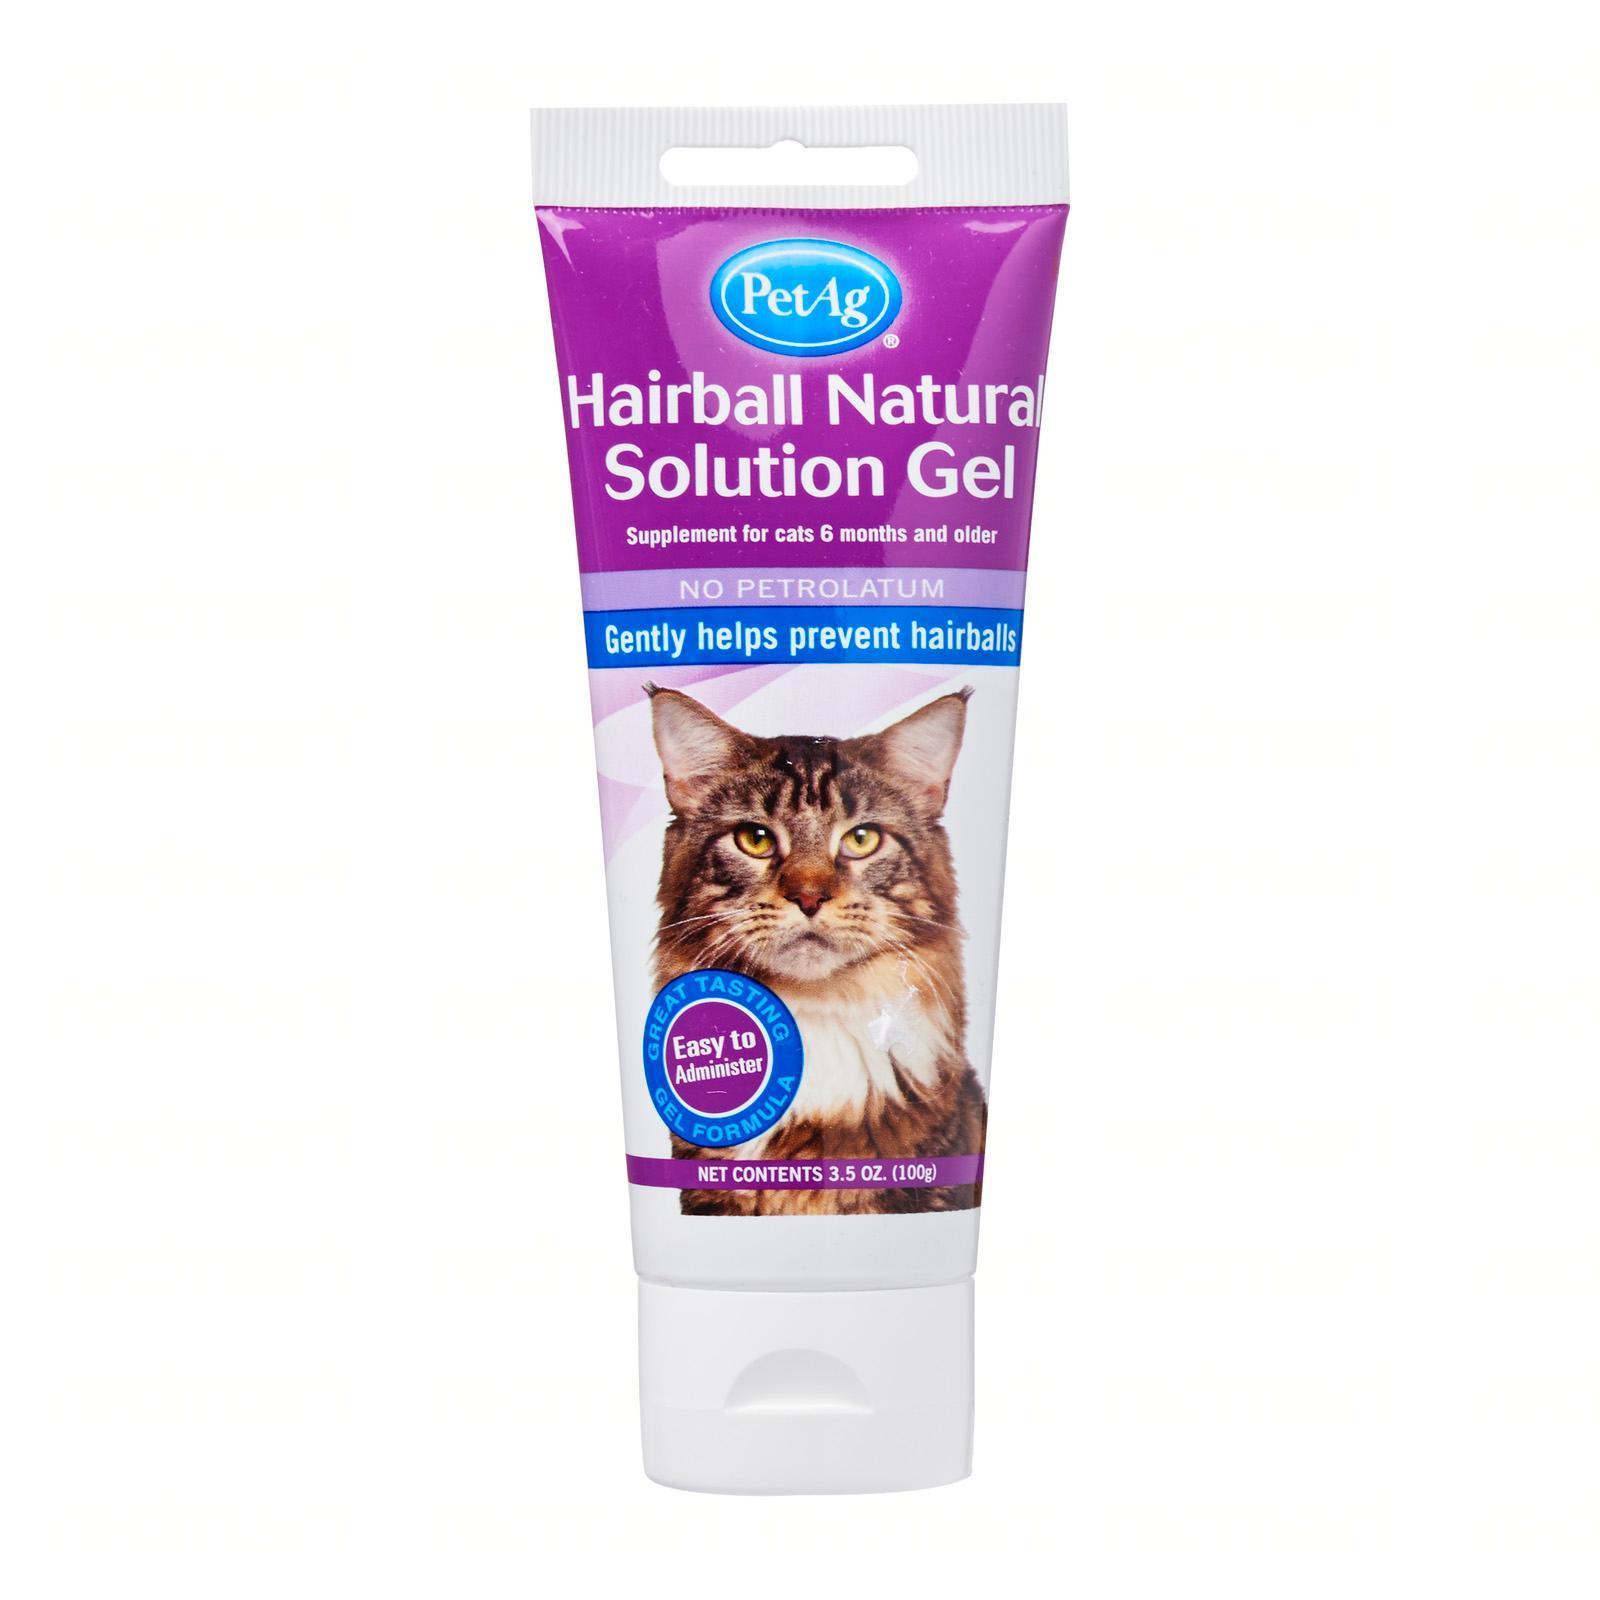 PetAg Cat Hairball Natural Solution Gel 3.5oz